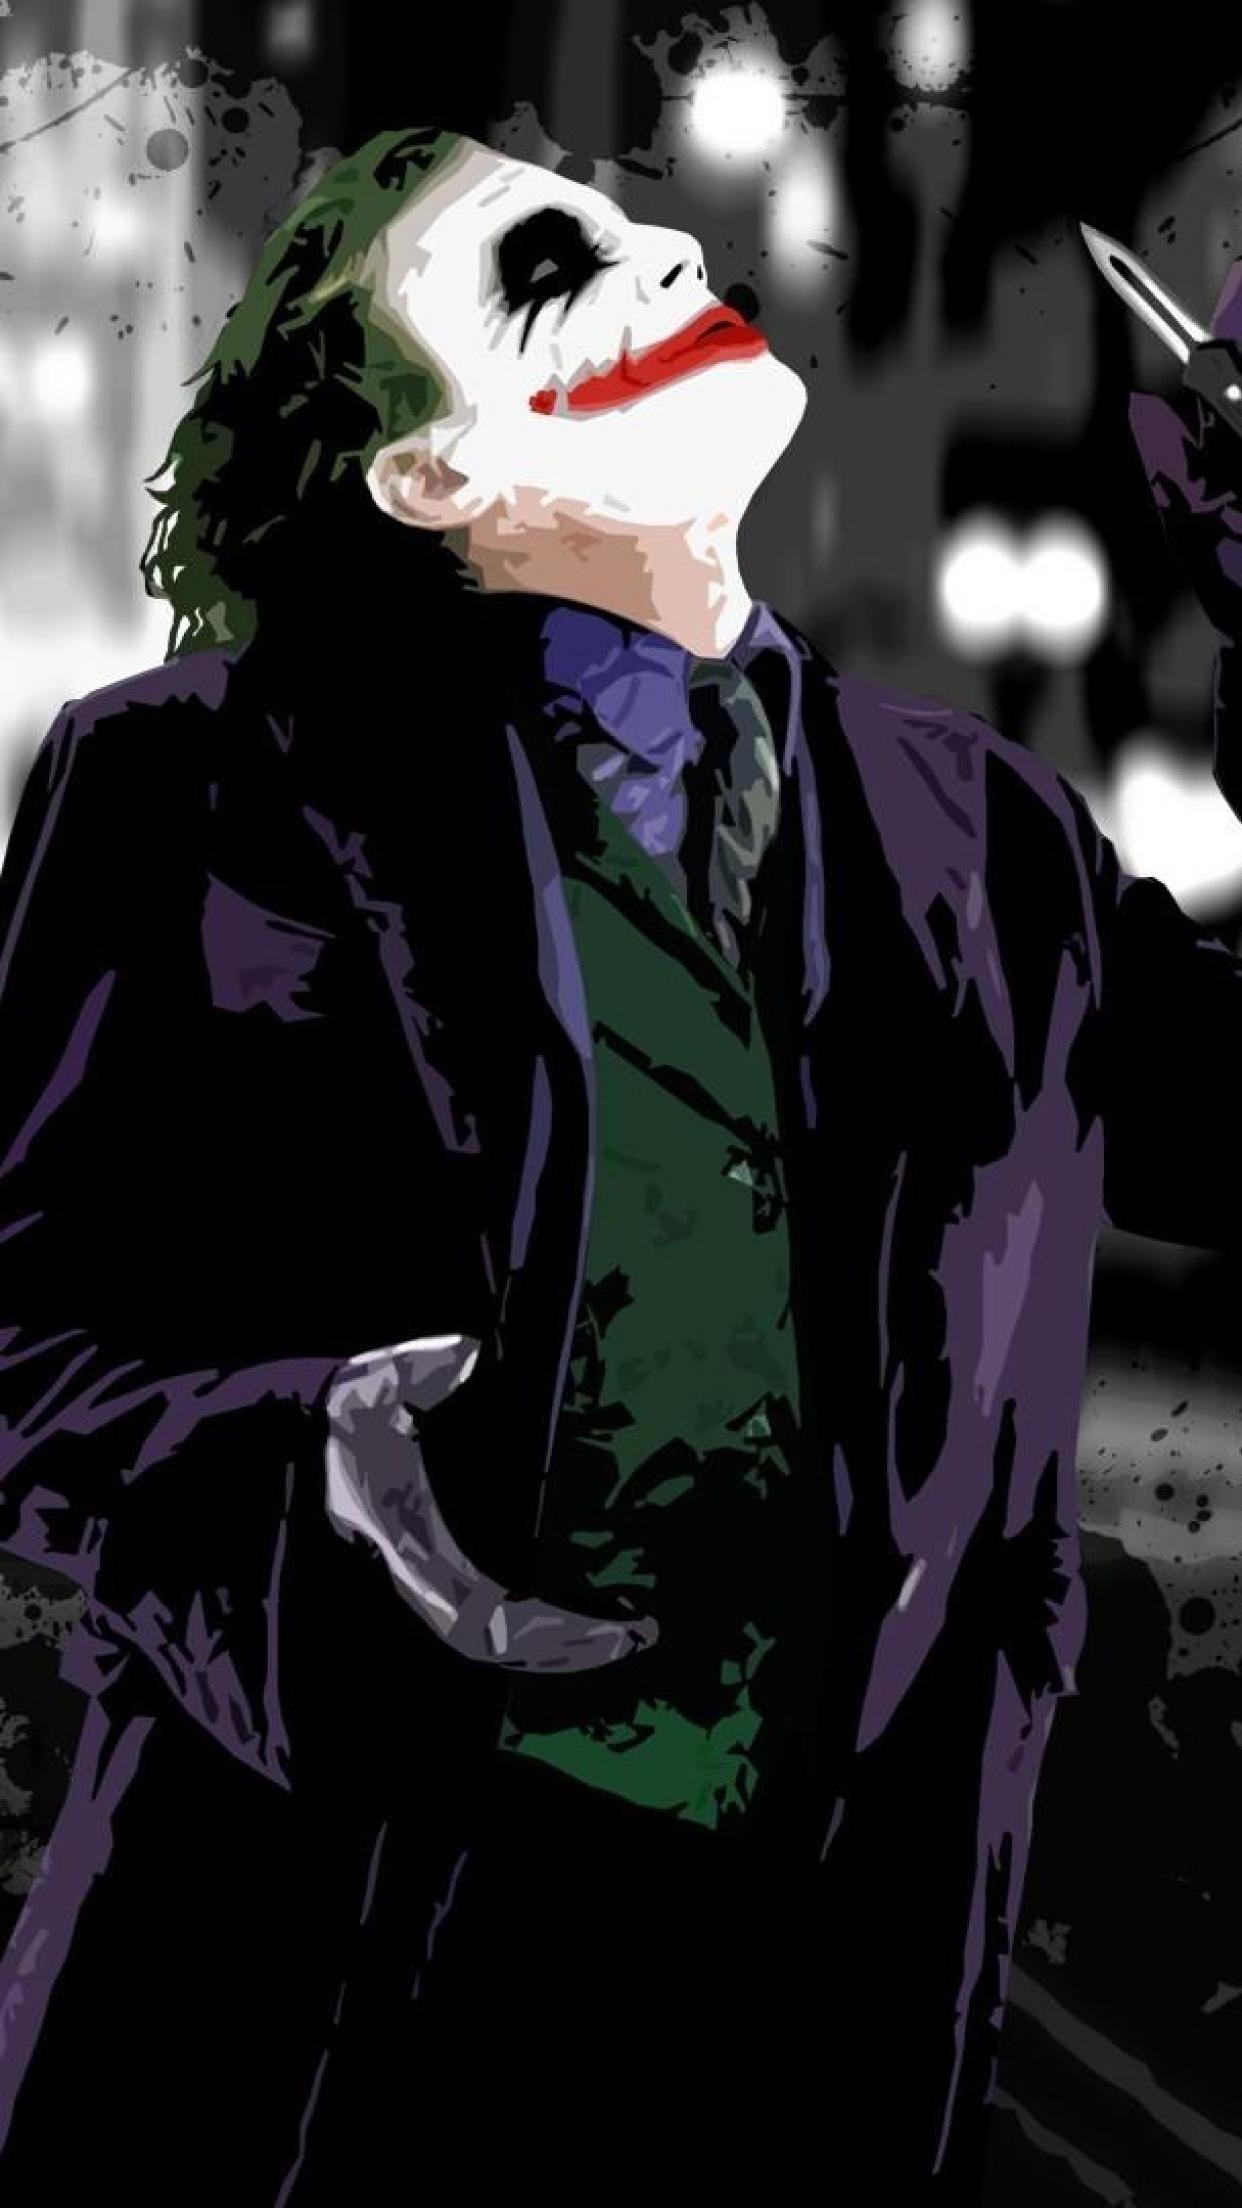 Pin by James Lindsay on DC Comics | Batman joker wallpaper ...